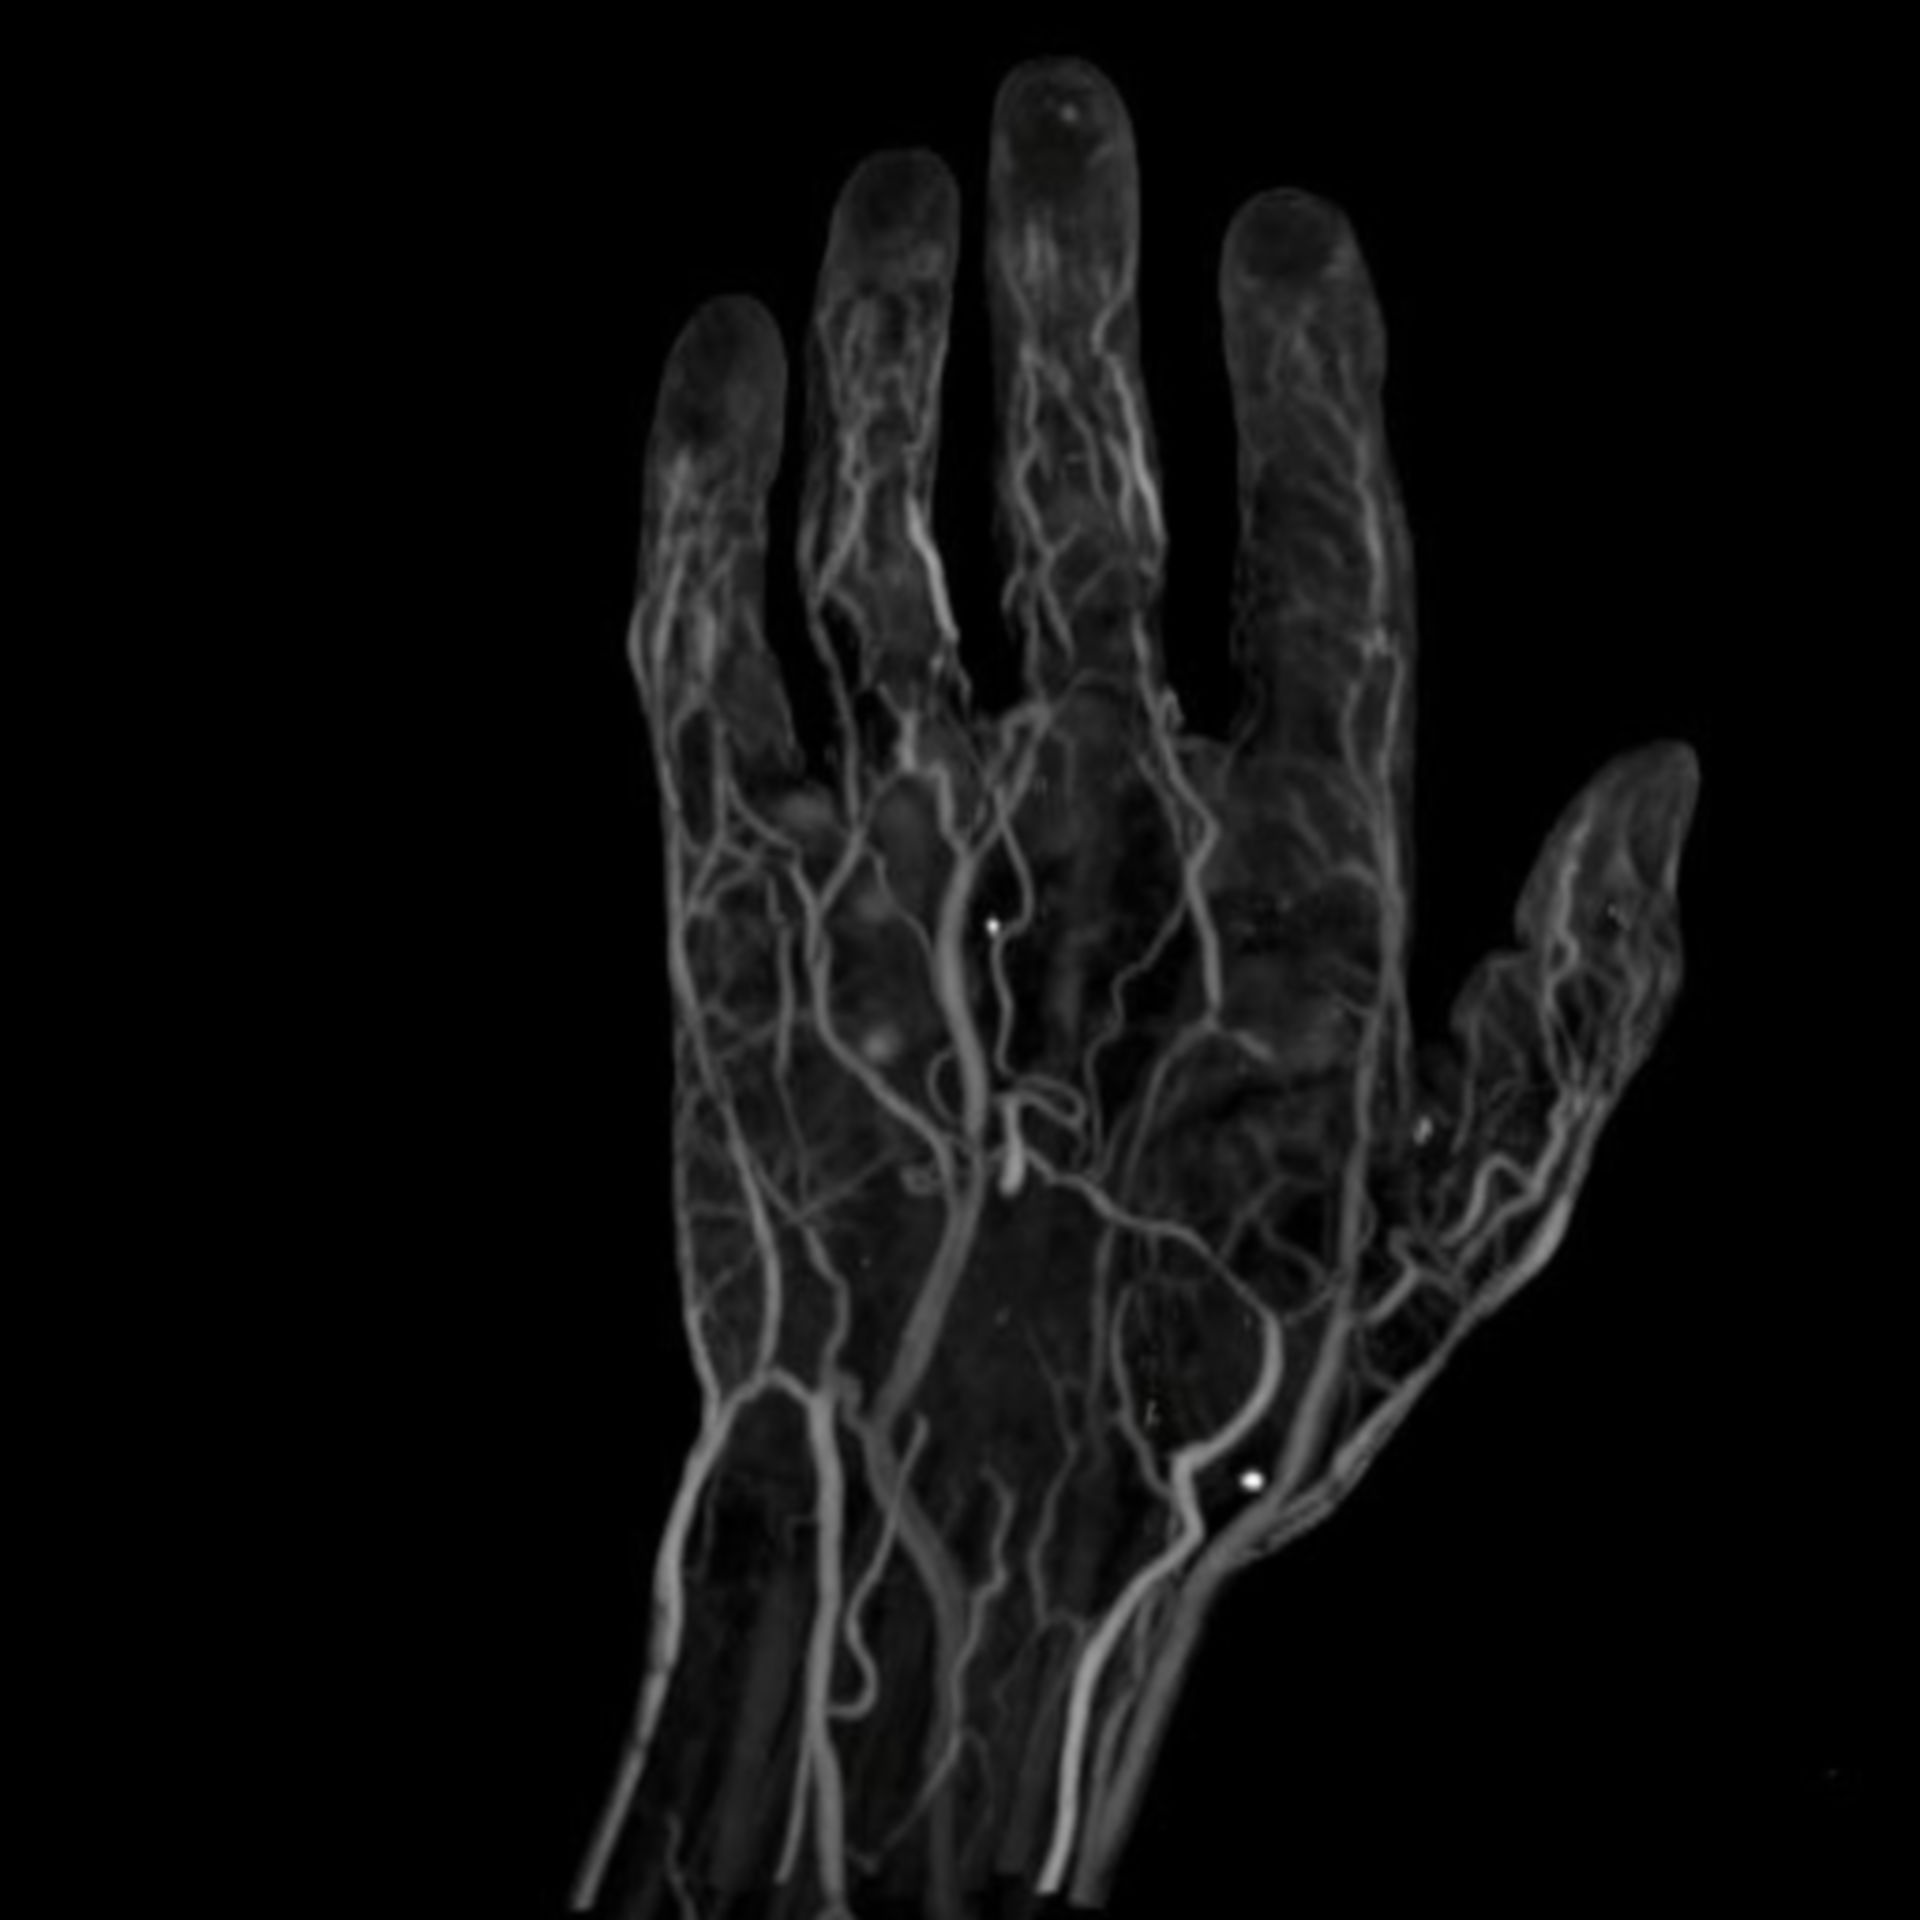 Angiografie Hand